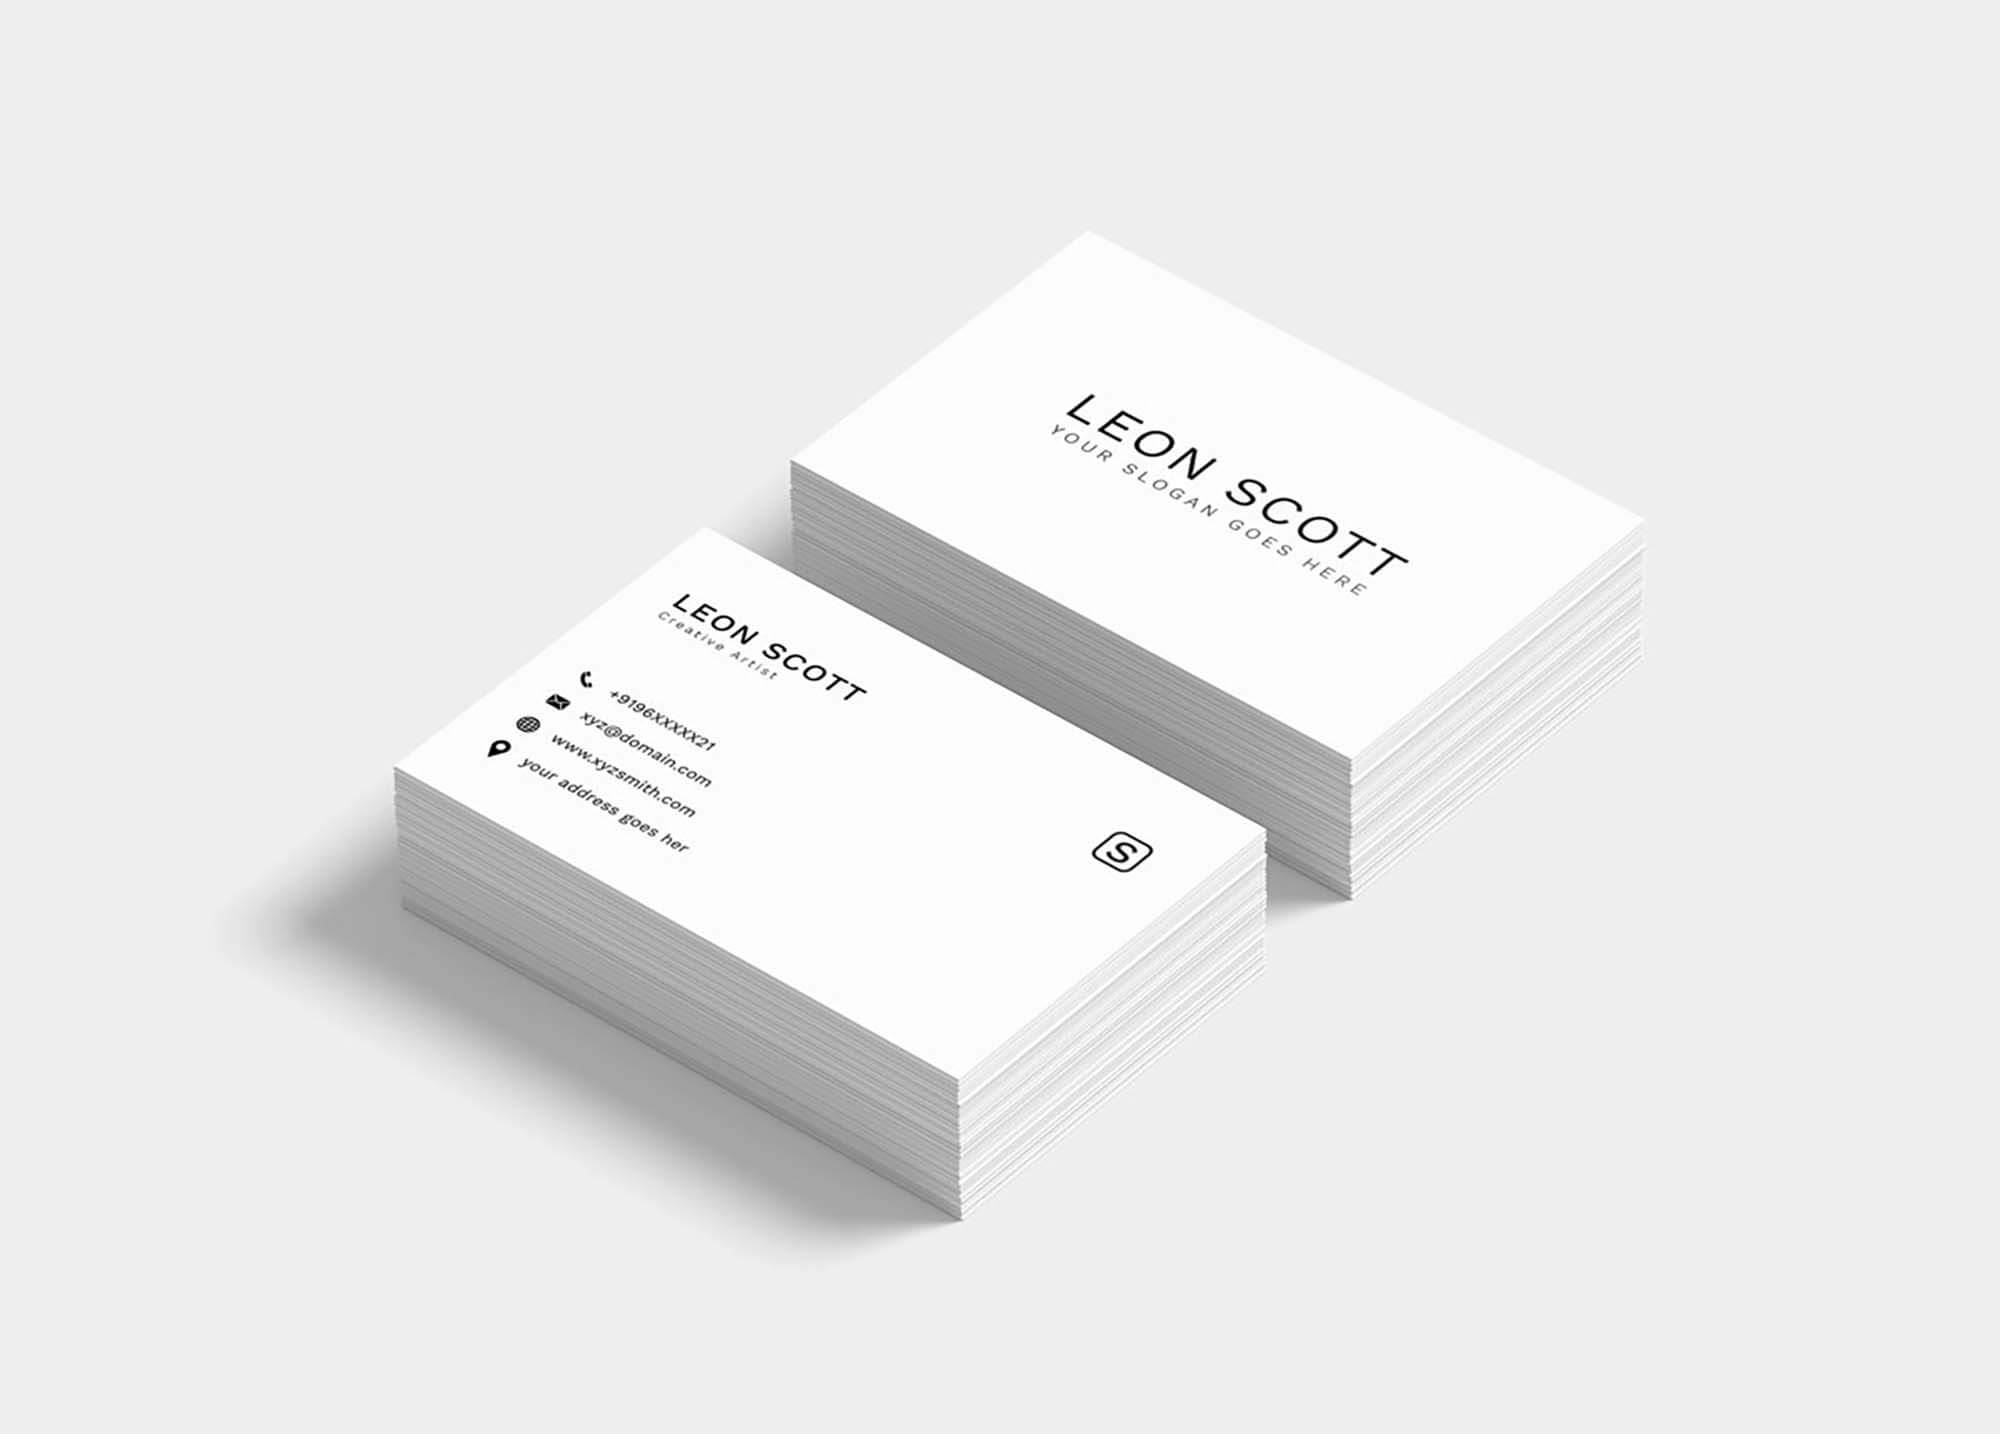 Free Minimal Elegant Business Card Template (Psd) With Free Business Card Templates In Psd Format